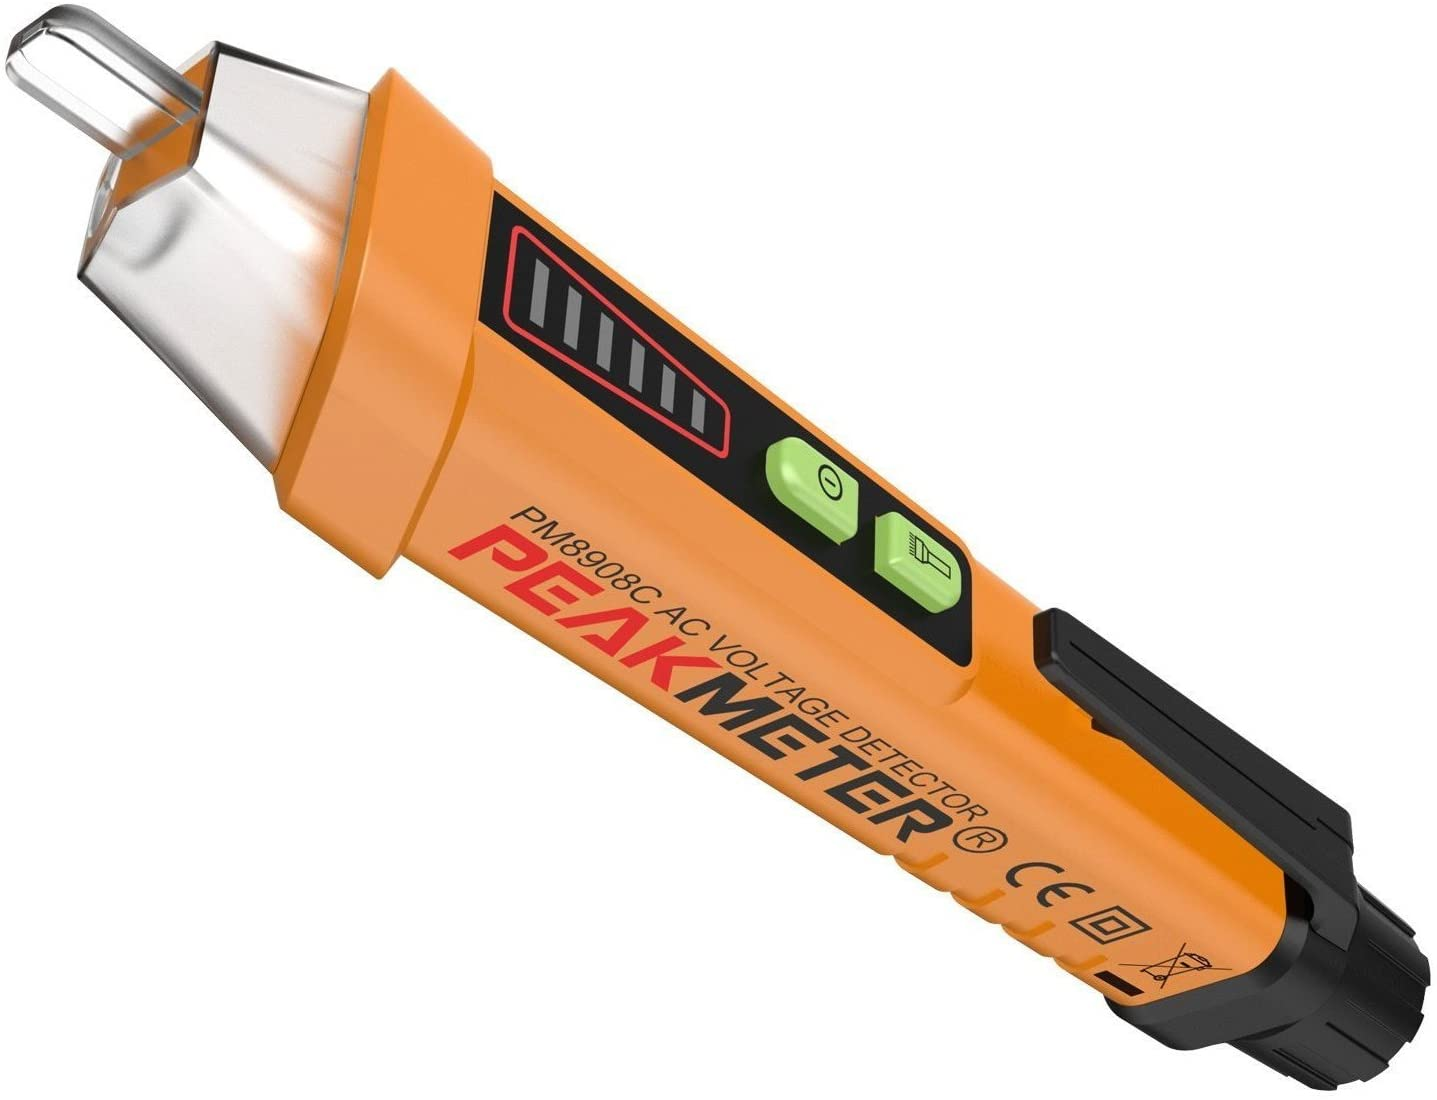 PriceBustr - Non Contact Voltage Detector, 12v-1000V AC Voltage Tester Pen & LED Flashlight by PriceBustr